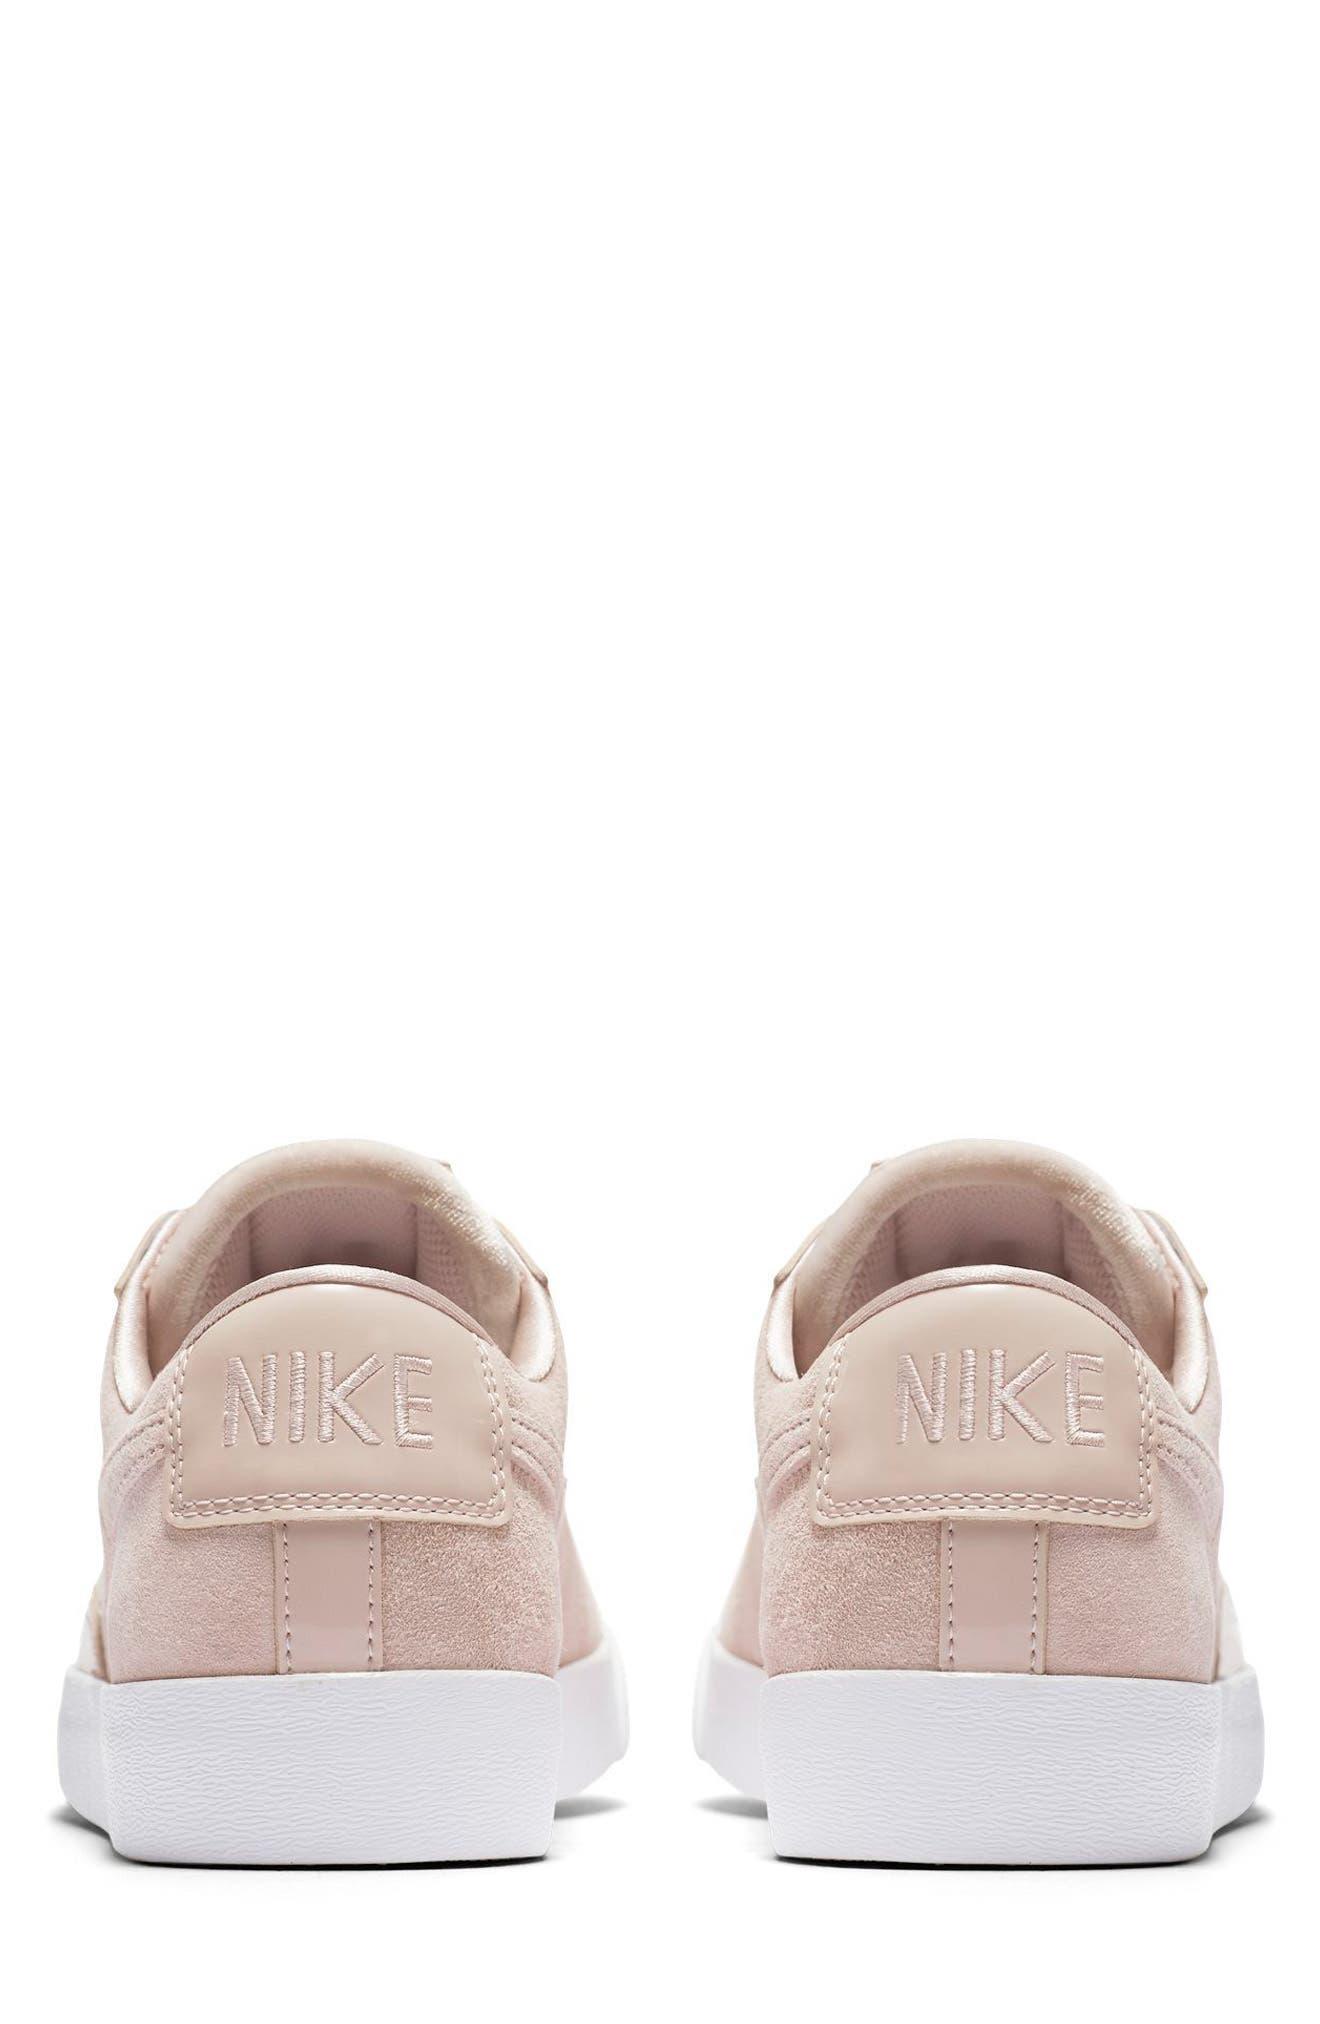 Blazer Low LX Sneaker,                             Alternate thumbnail 2, color,                             Silt Red/ Brown/ White